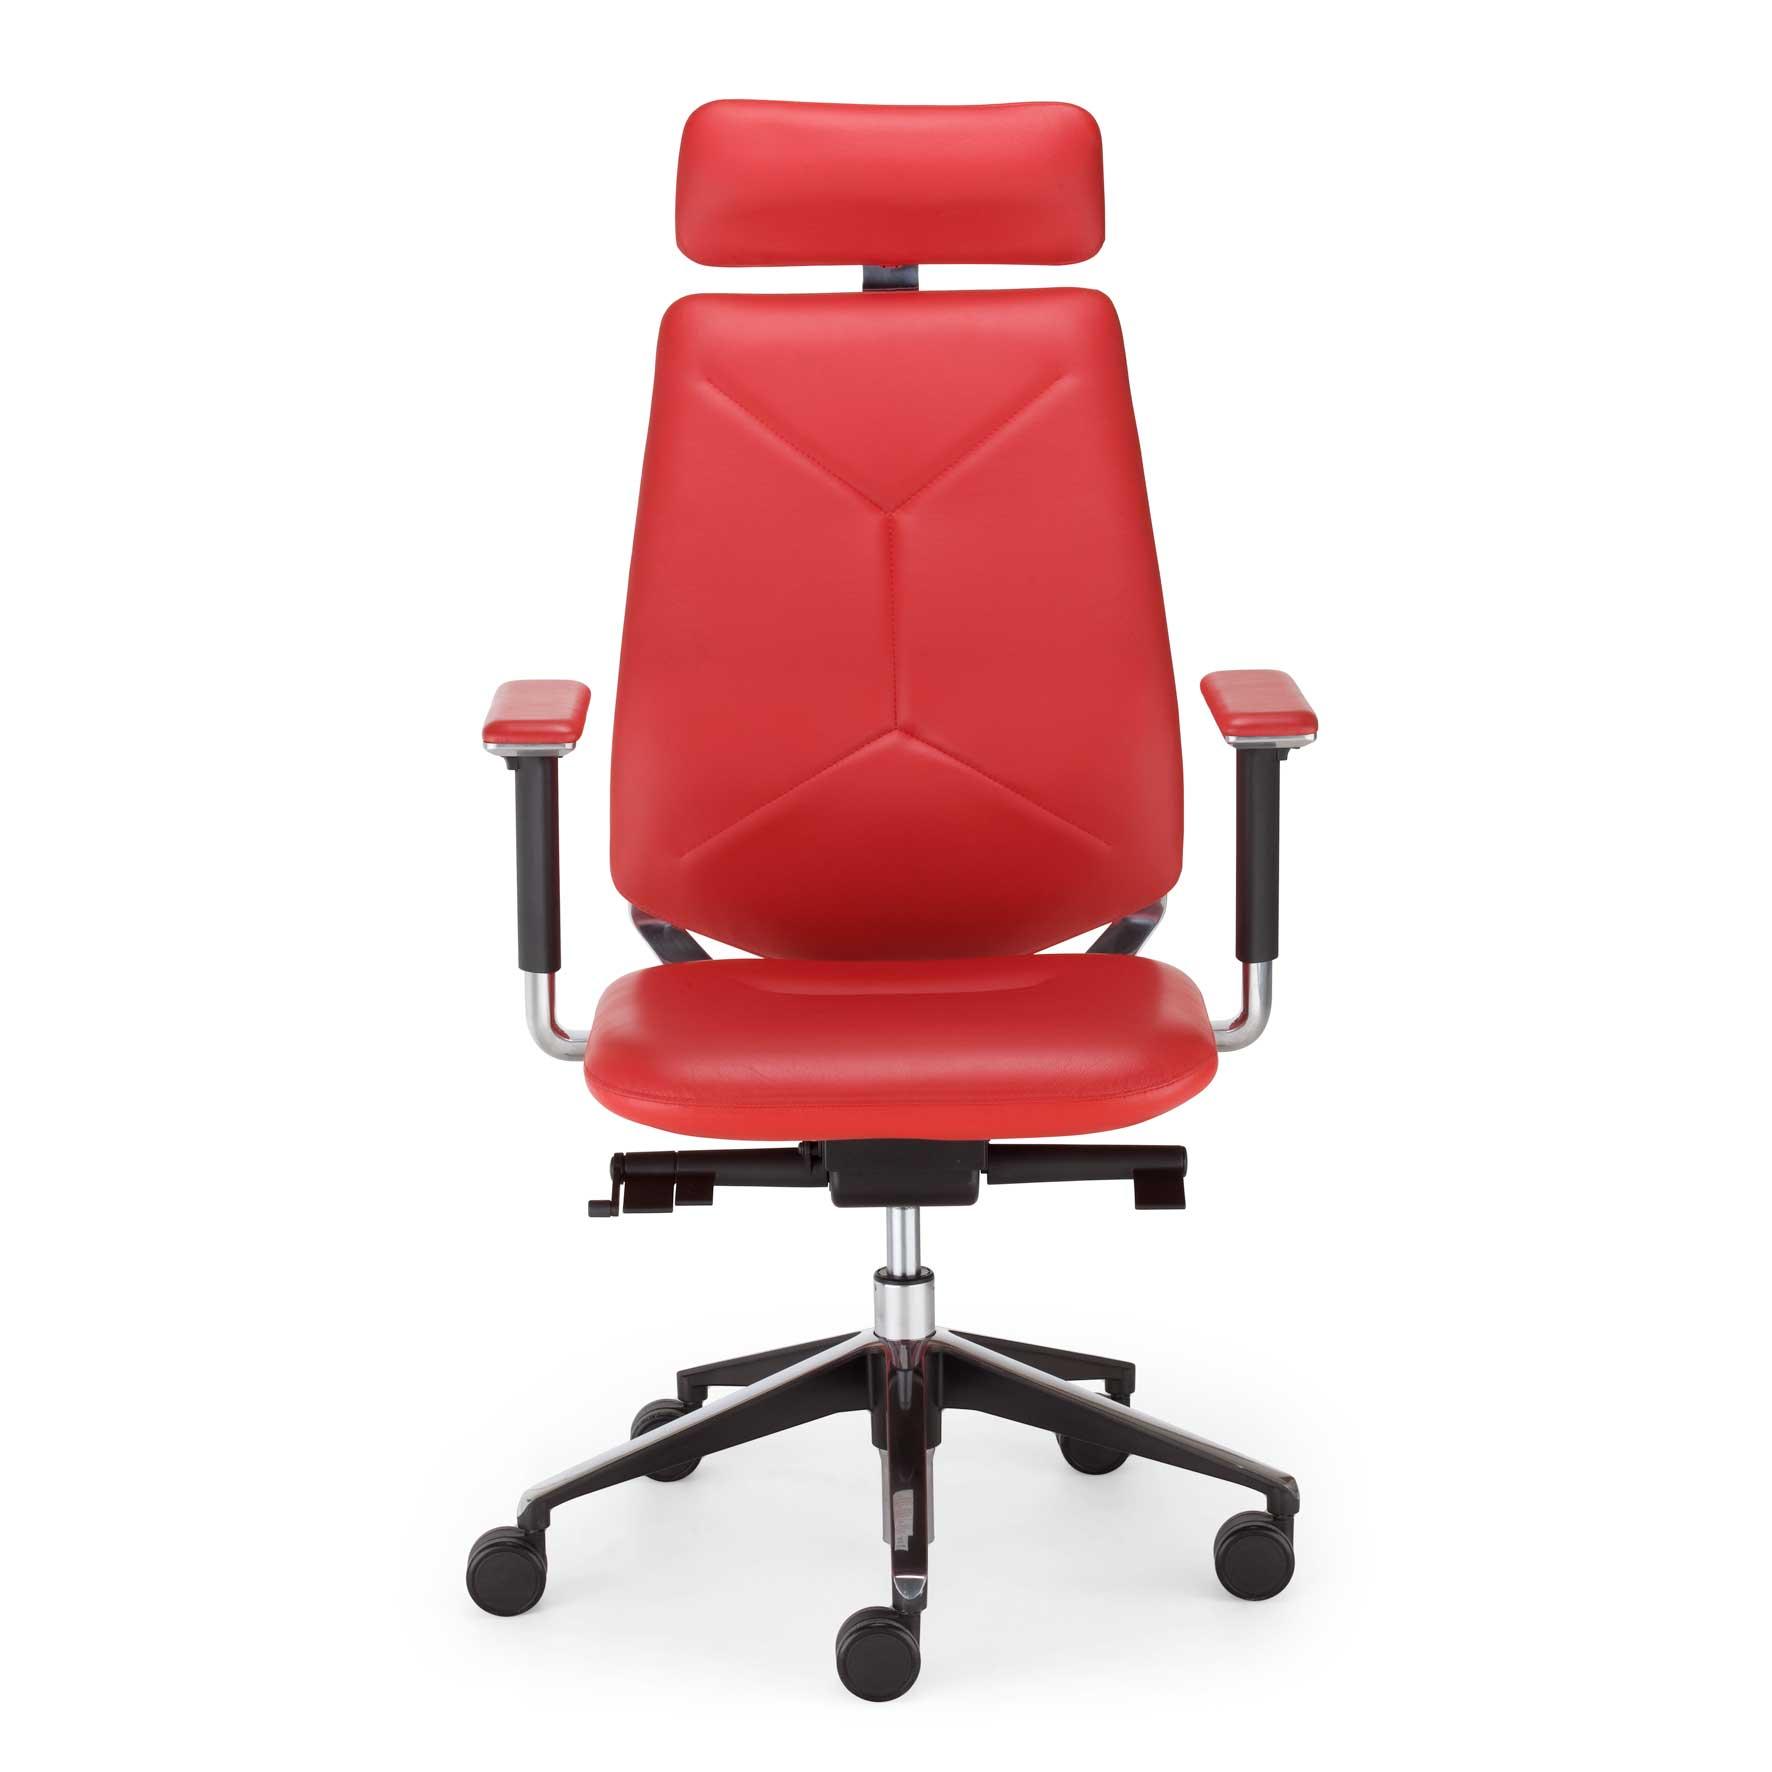 https://sedni.bg/clients/168/images/catalog/products/00ec0e51bde715aa_Next_U_HR_R23P1_steel29_chrome_EpronSyncron_Plus_seat_slidingLE05_przod.jpg